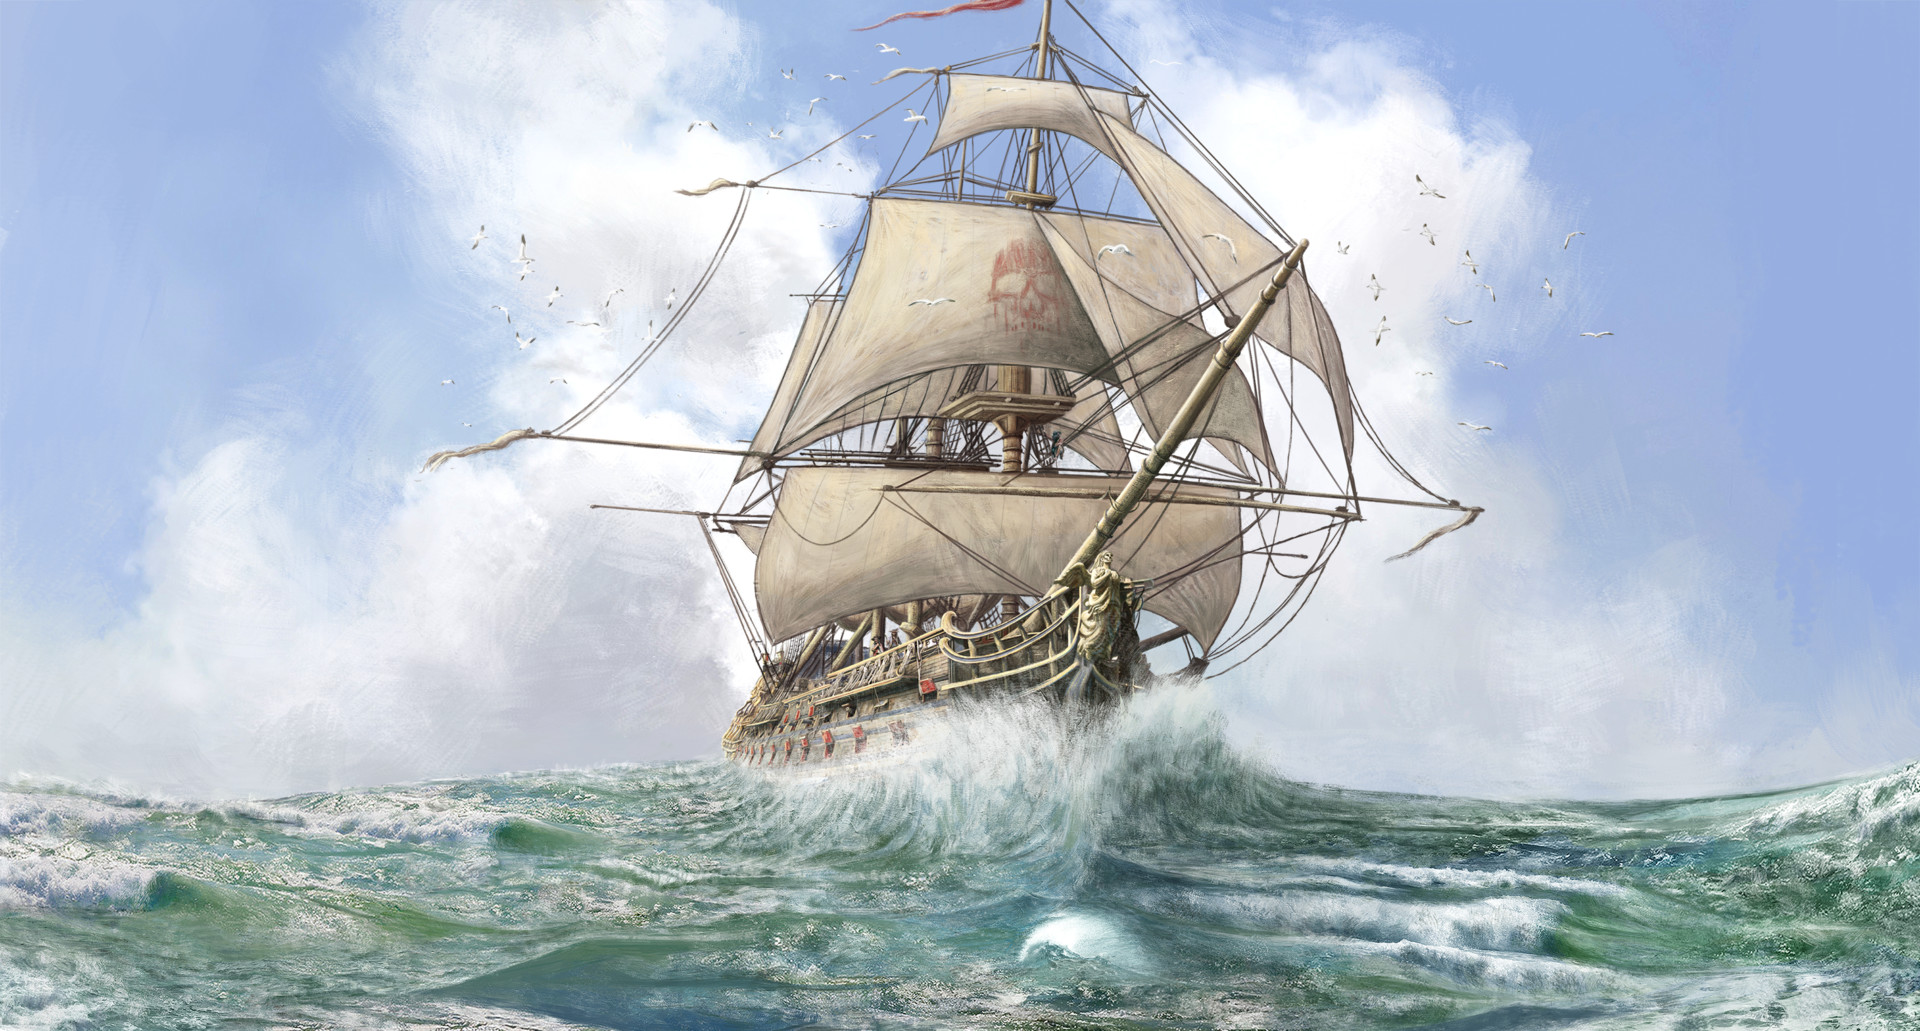 Martin seidl fancy pirate ship mindre utan sign artstation